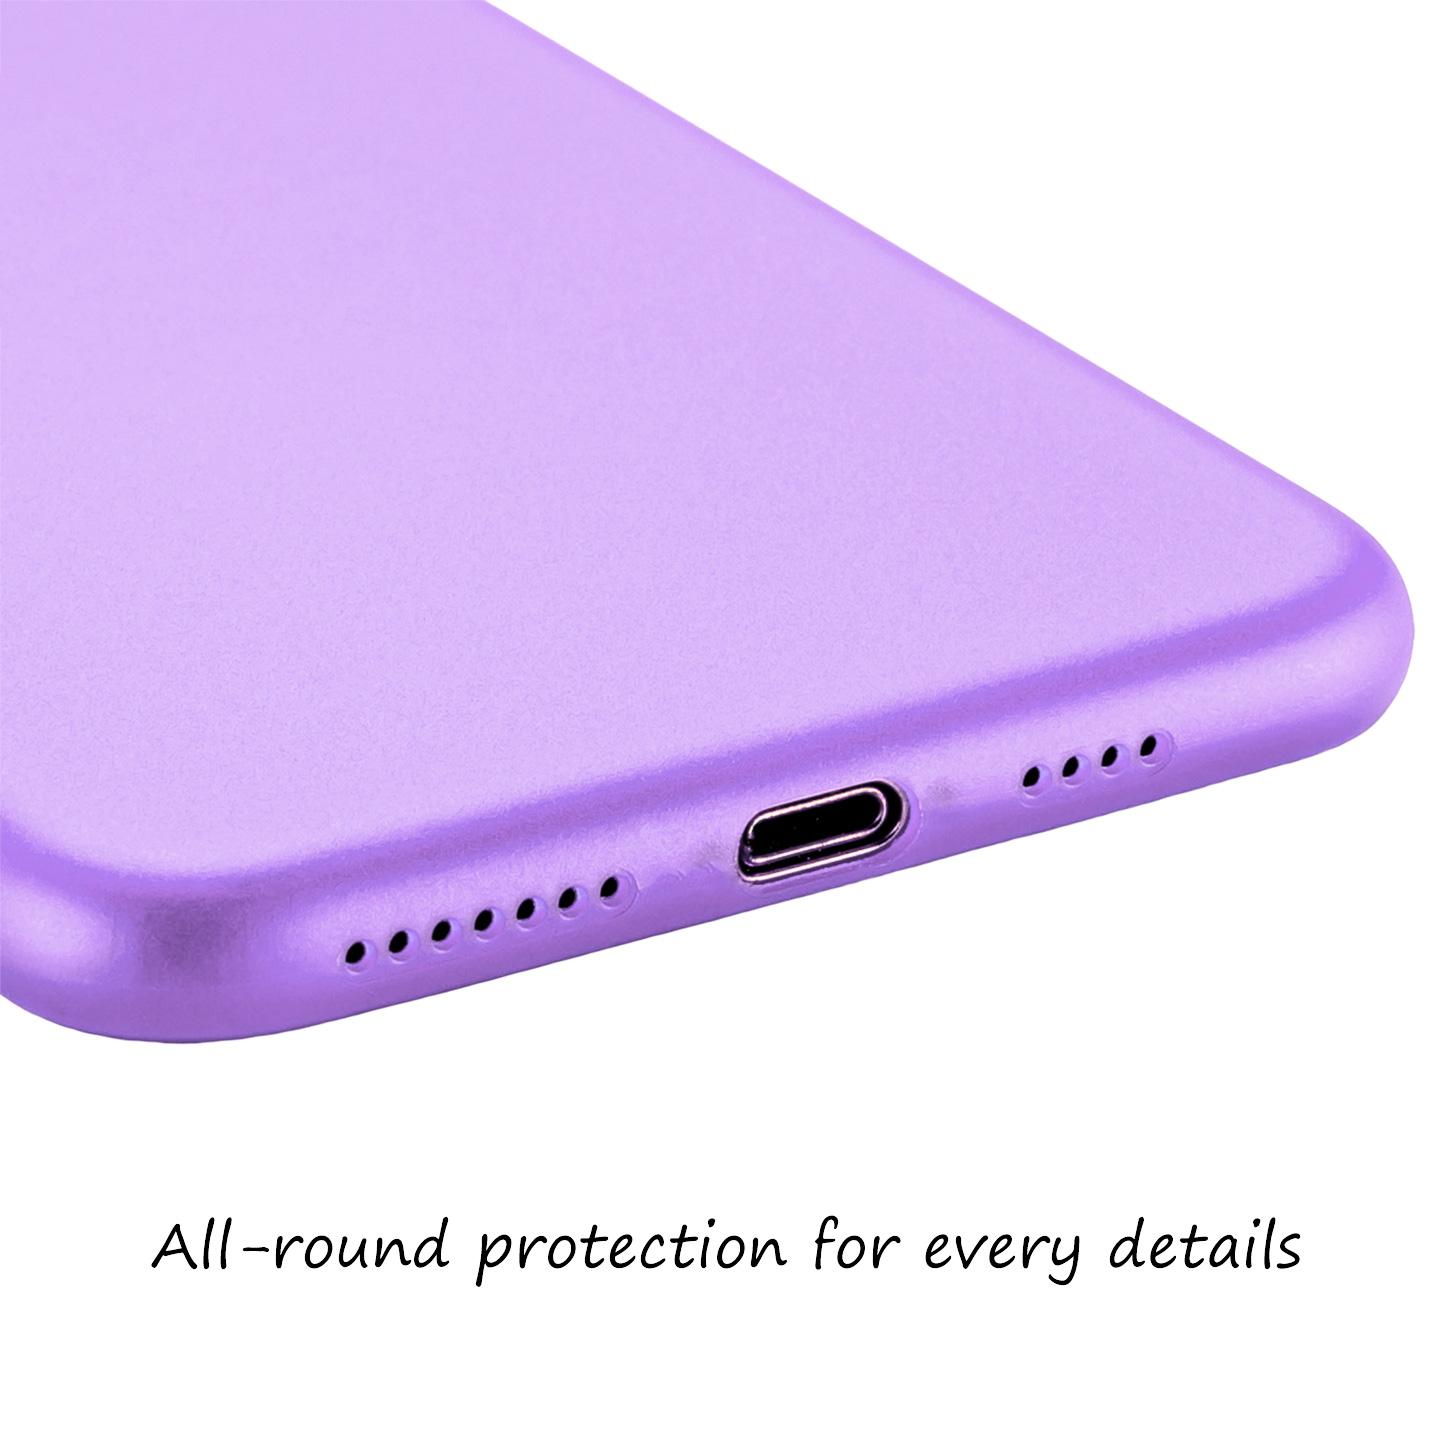 Ultra-Slim-Case-iPhone-11-Pro-5-8-034-Matt-Clear-Schutz-Huelle-Skin-Cover-Etui-Folie Indexbild 24